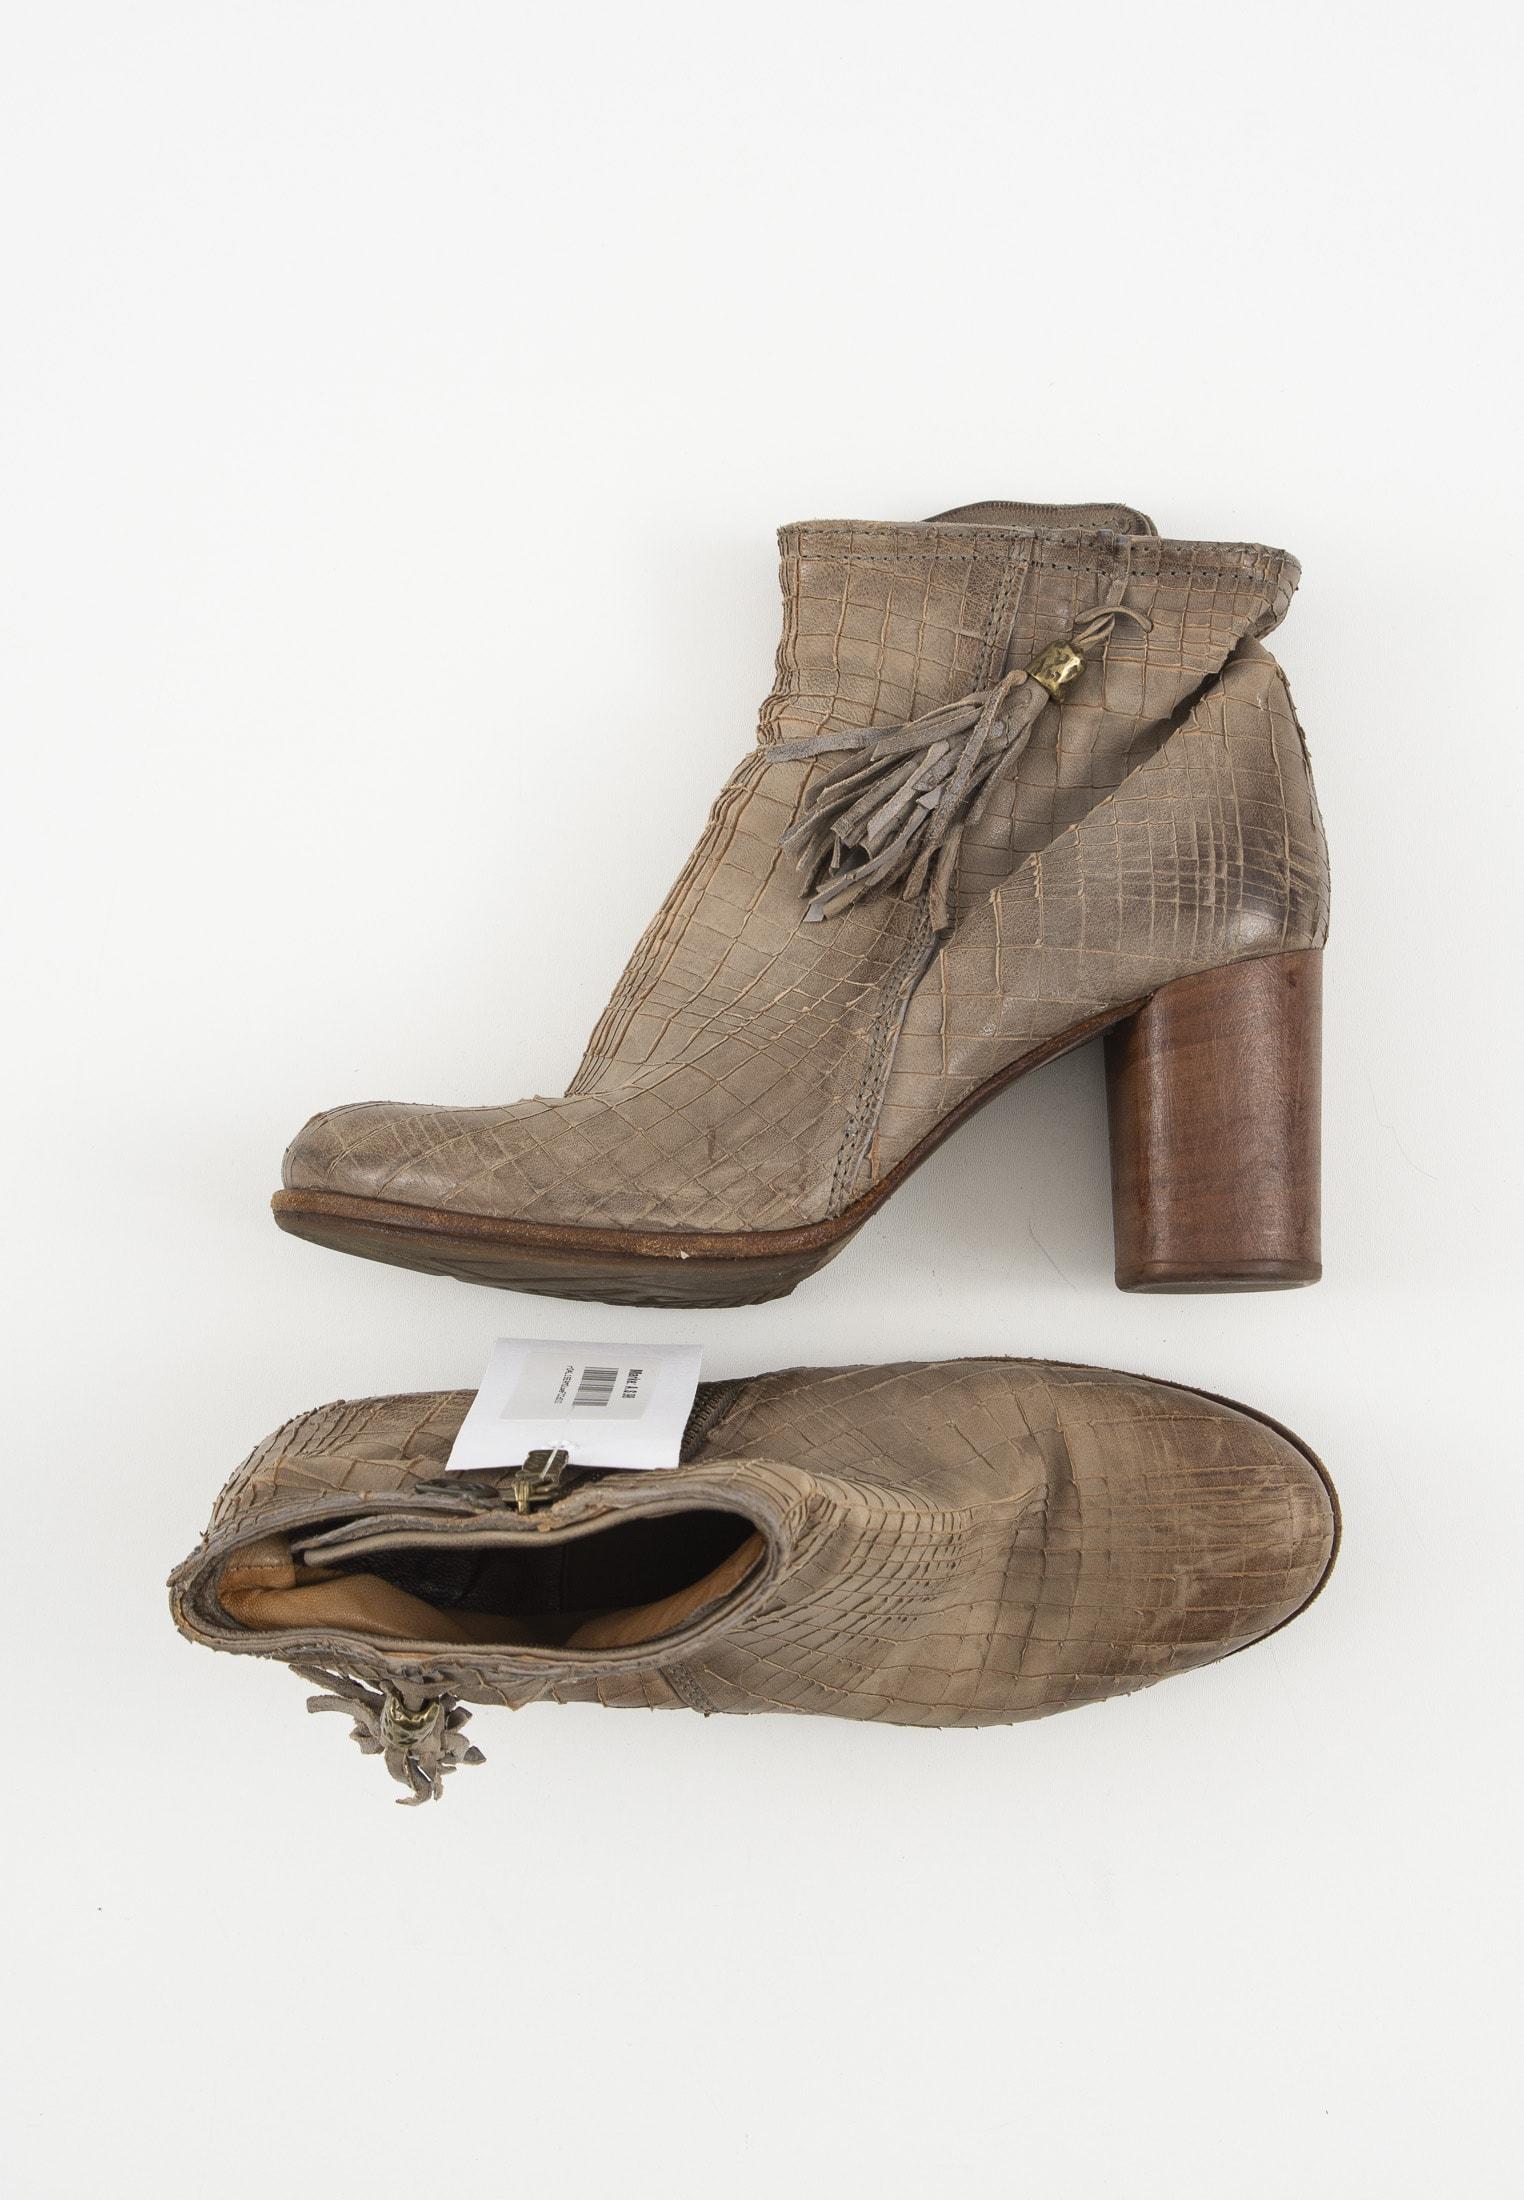 A.S.98 Stiefel / Stiefelette / Boots Beige Gr.42